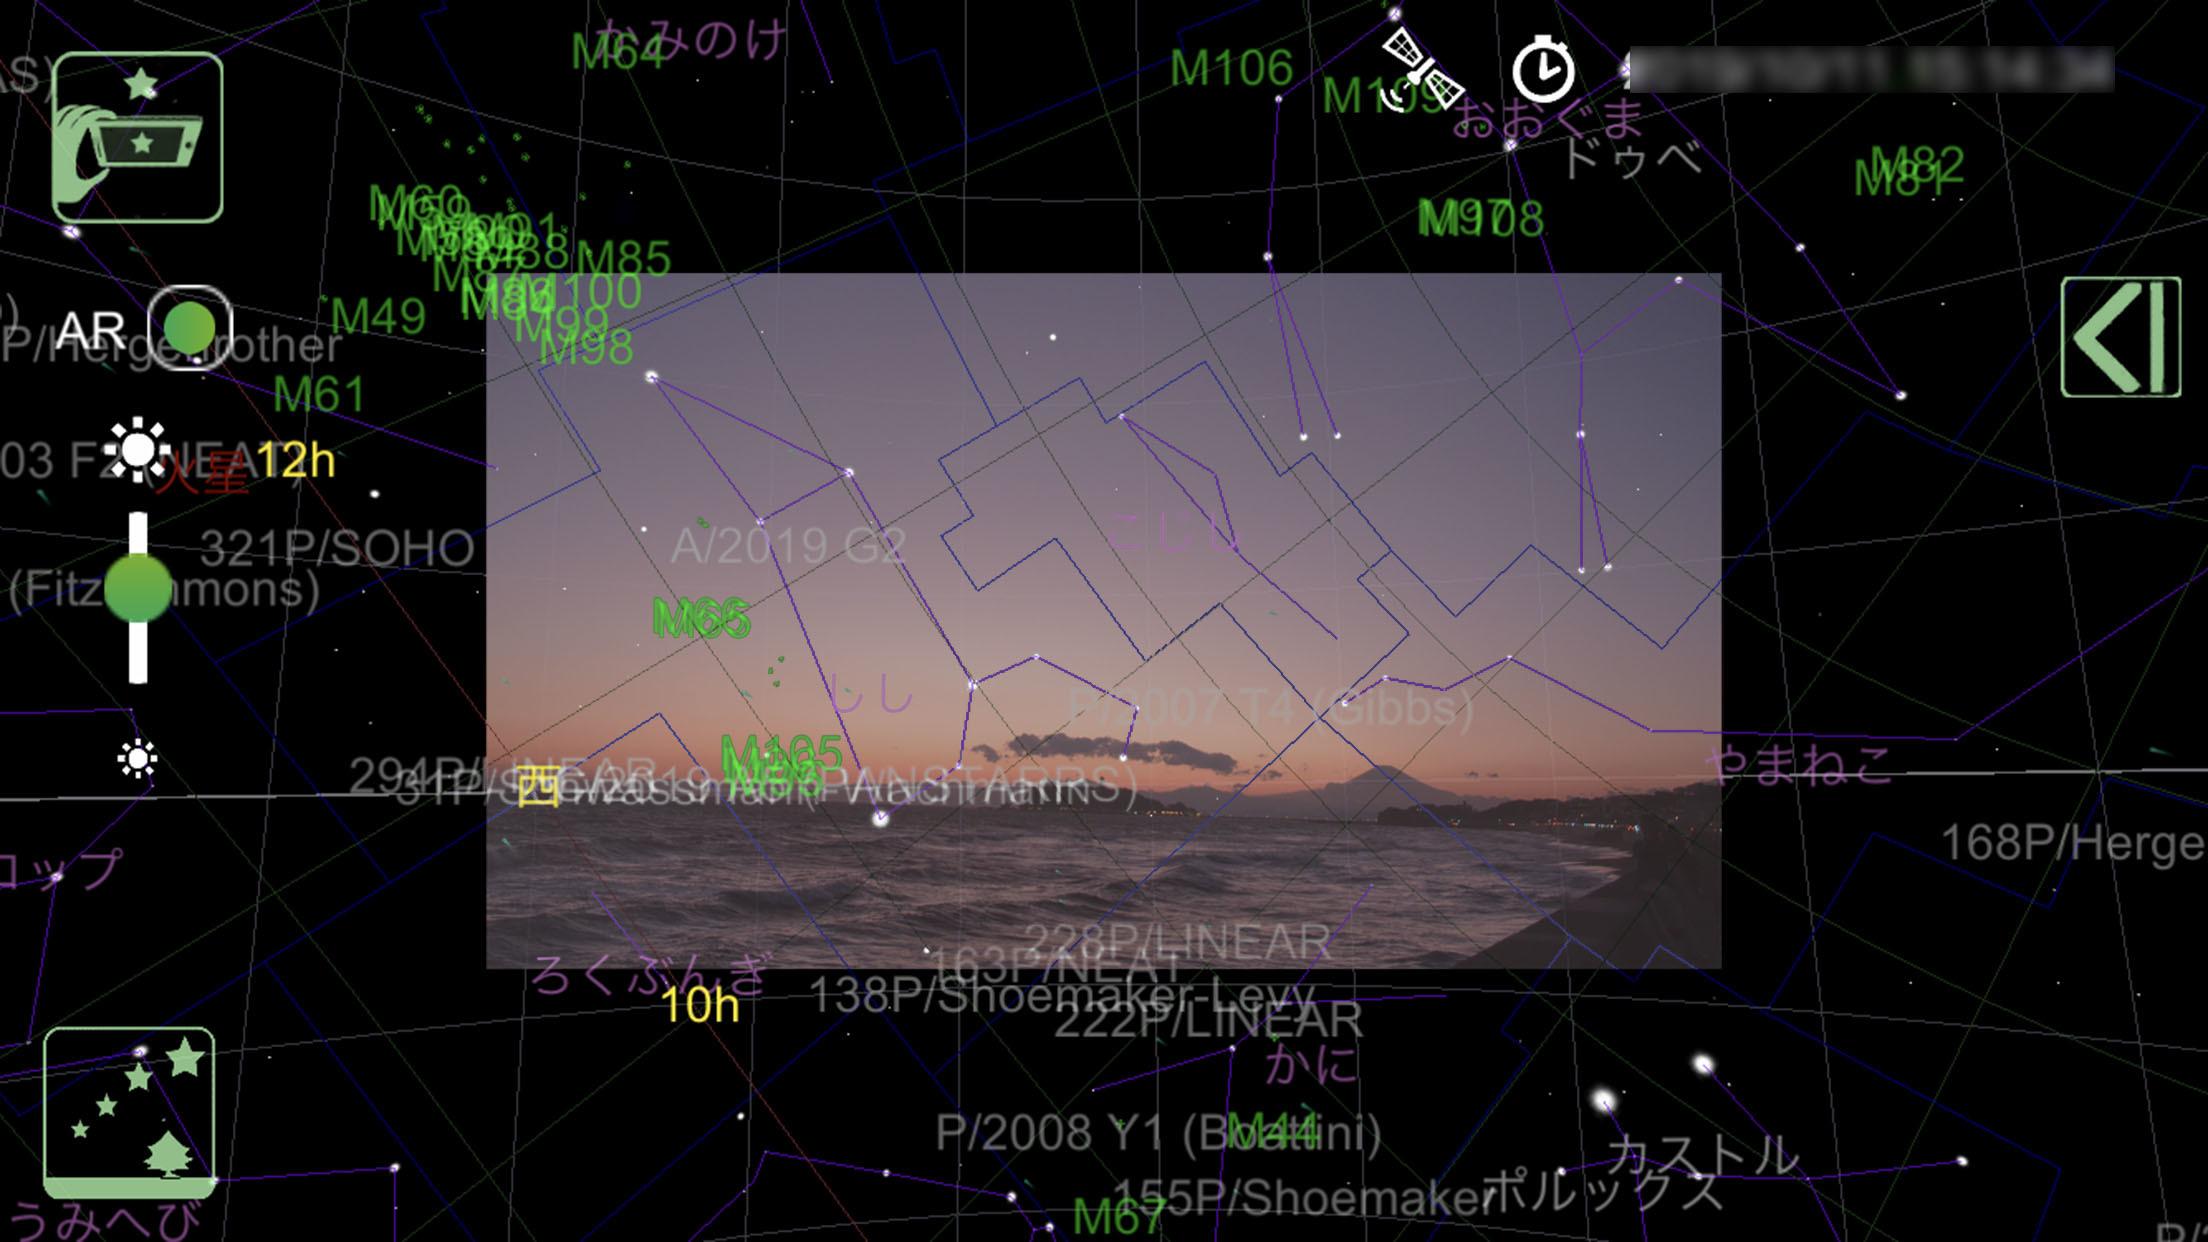 StarsPhotoLite-星を見よう ご紹介します_b0400557_20474019.jpg